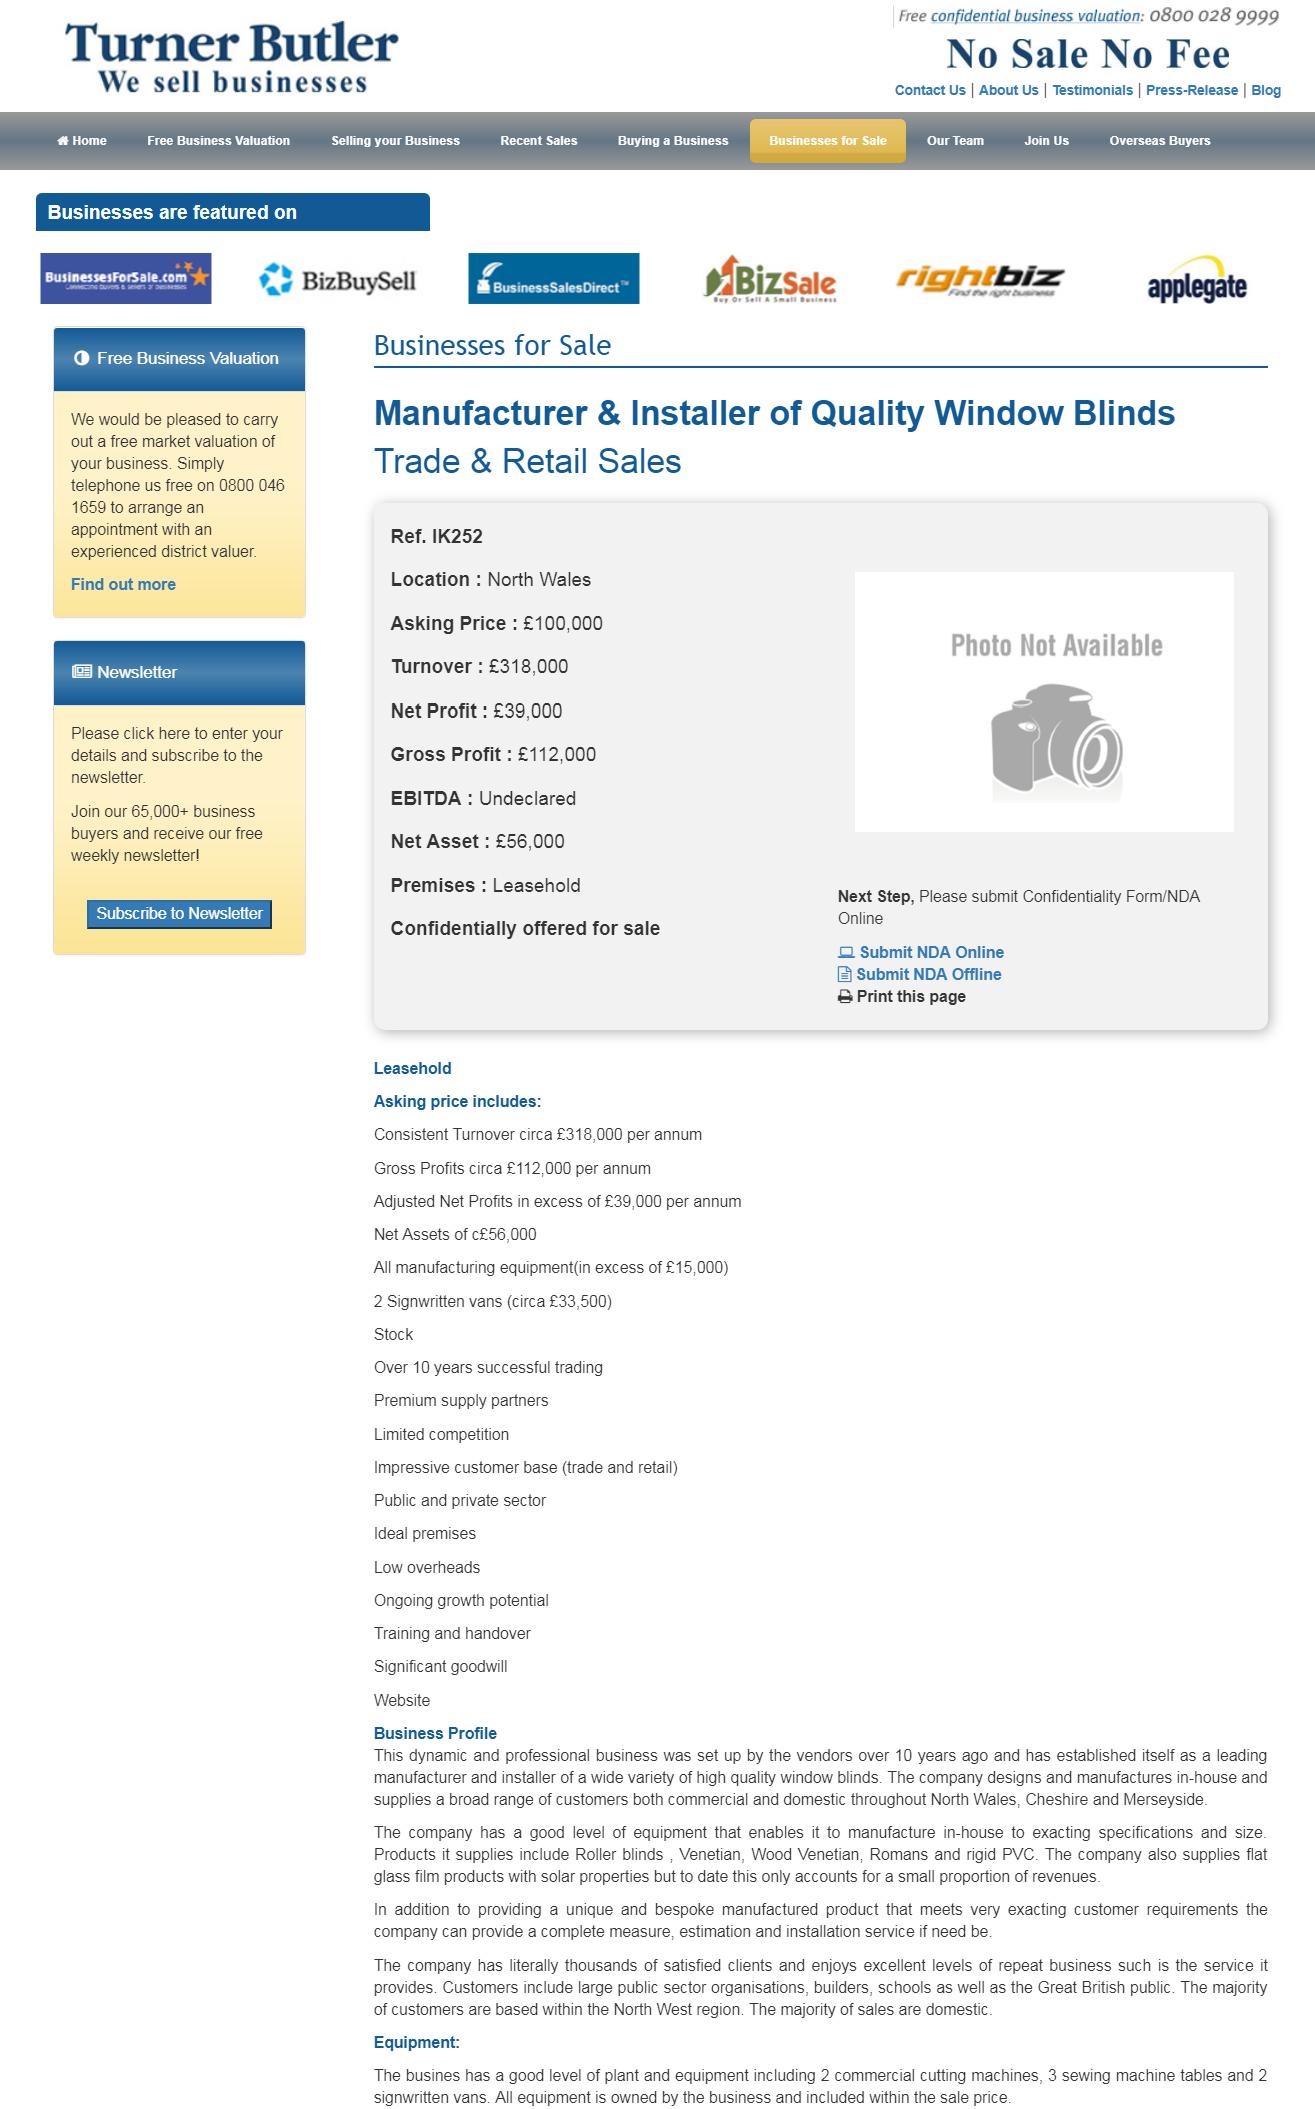 Business for sale Manufacturer & Installer of Quality